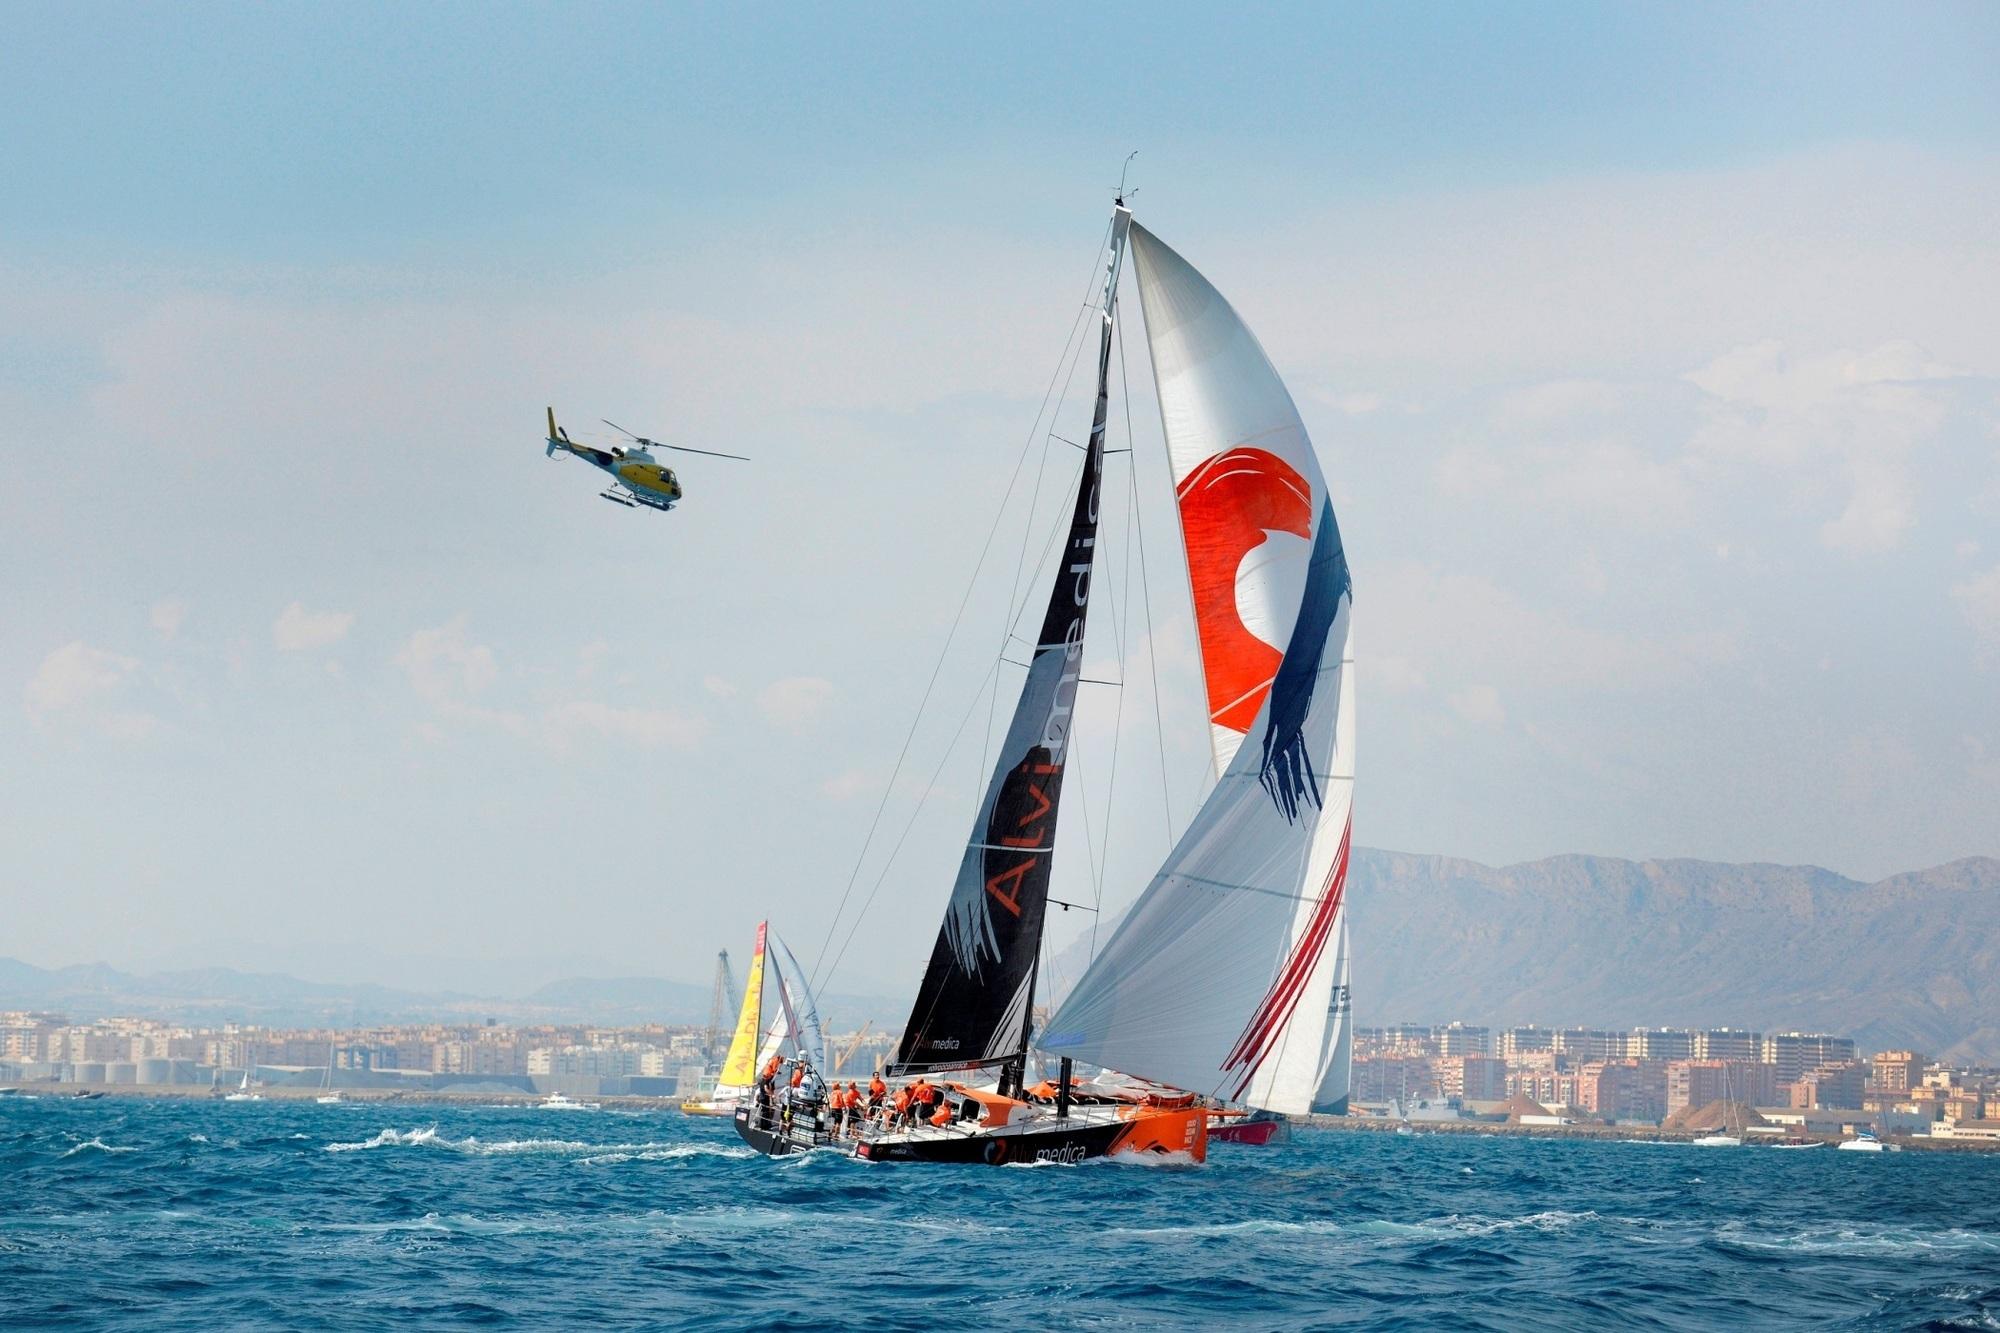 Panorama: Volvo Ocean Race - Imageaufbau unter Segeln